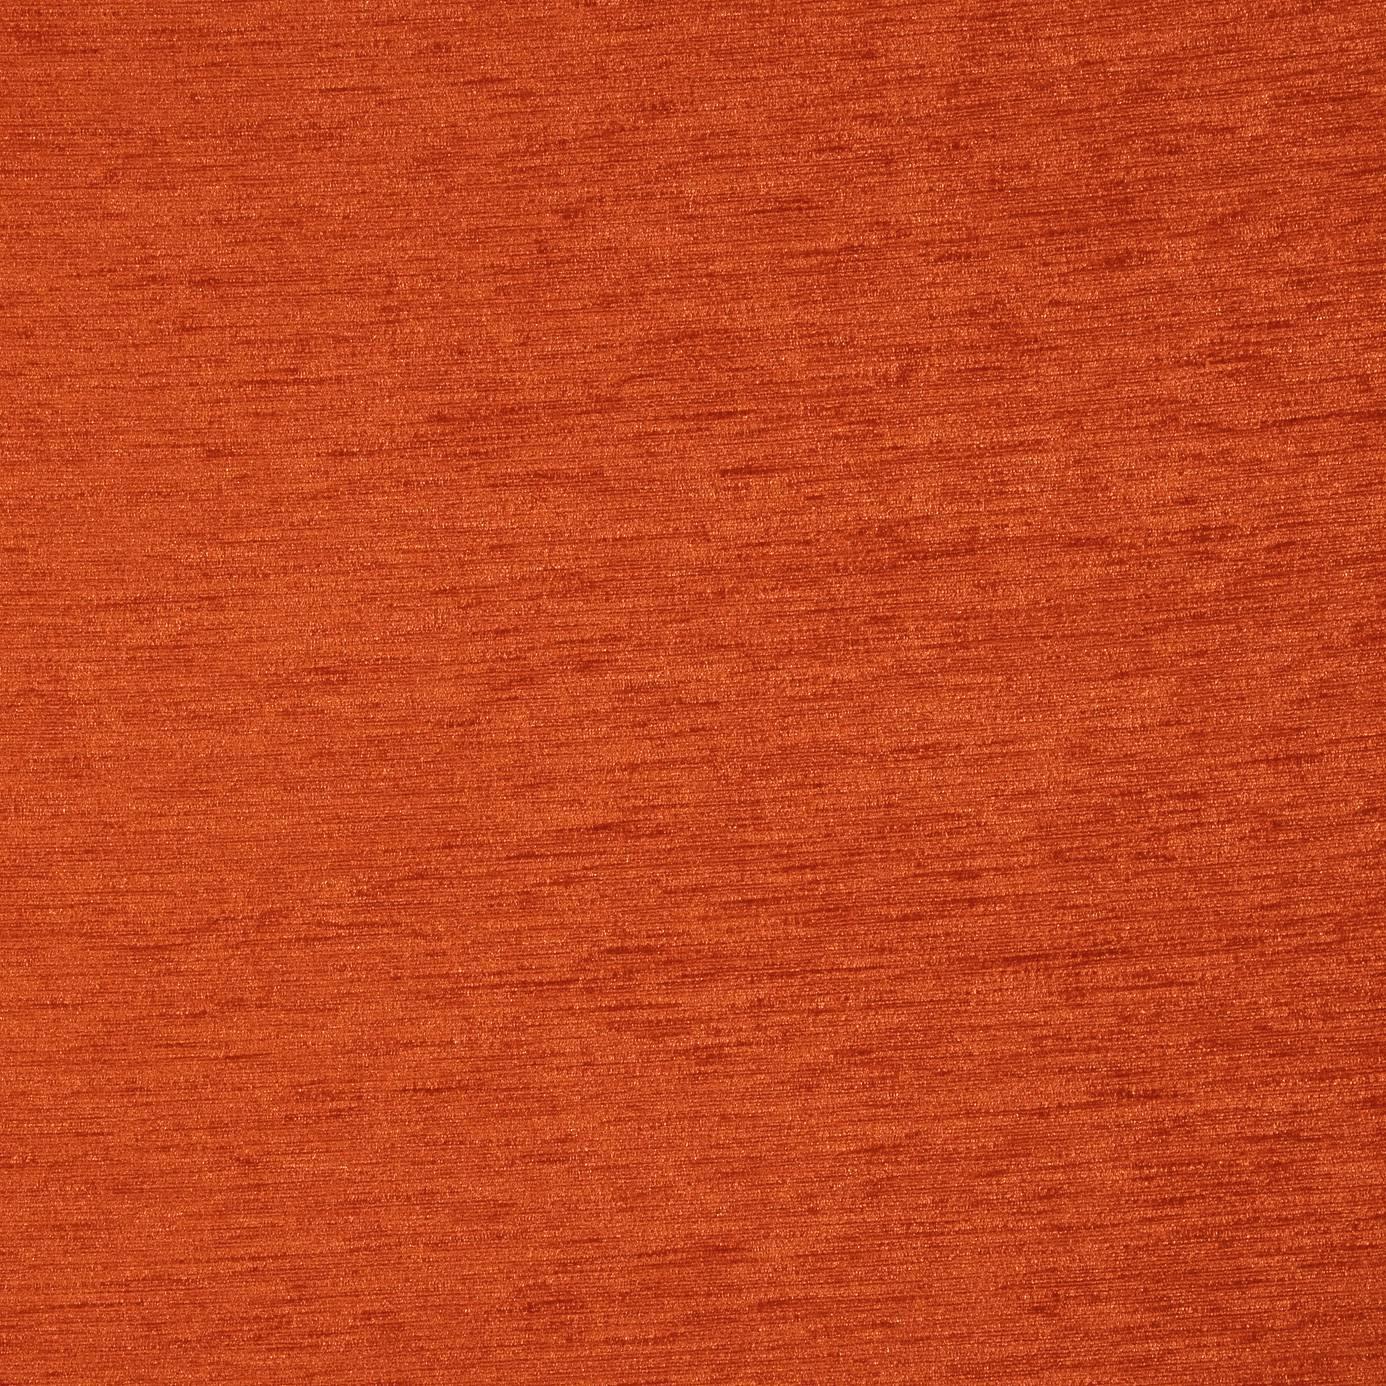 Kensington fabric spice kensingtonspace fryetts for Space fabric uk